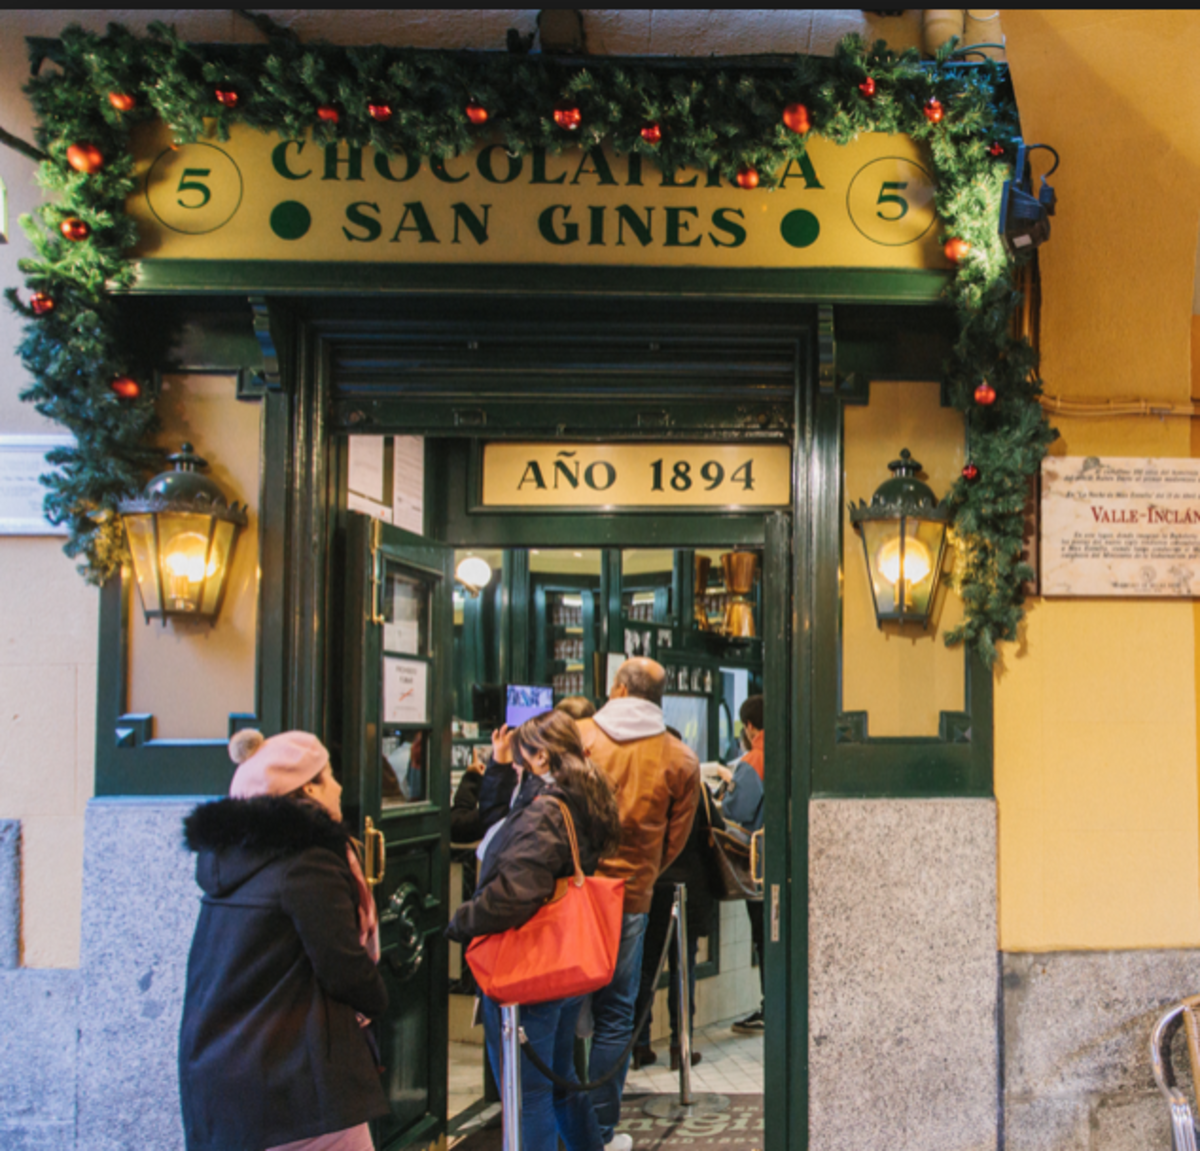 The Best Chocolatería in Spain